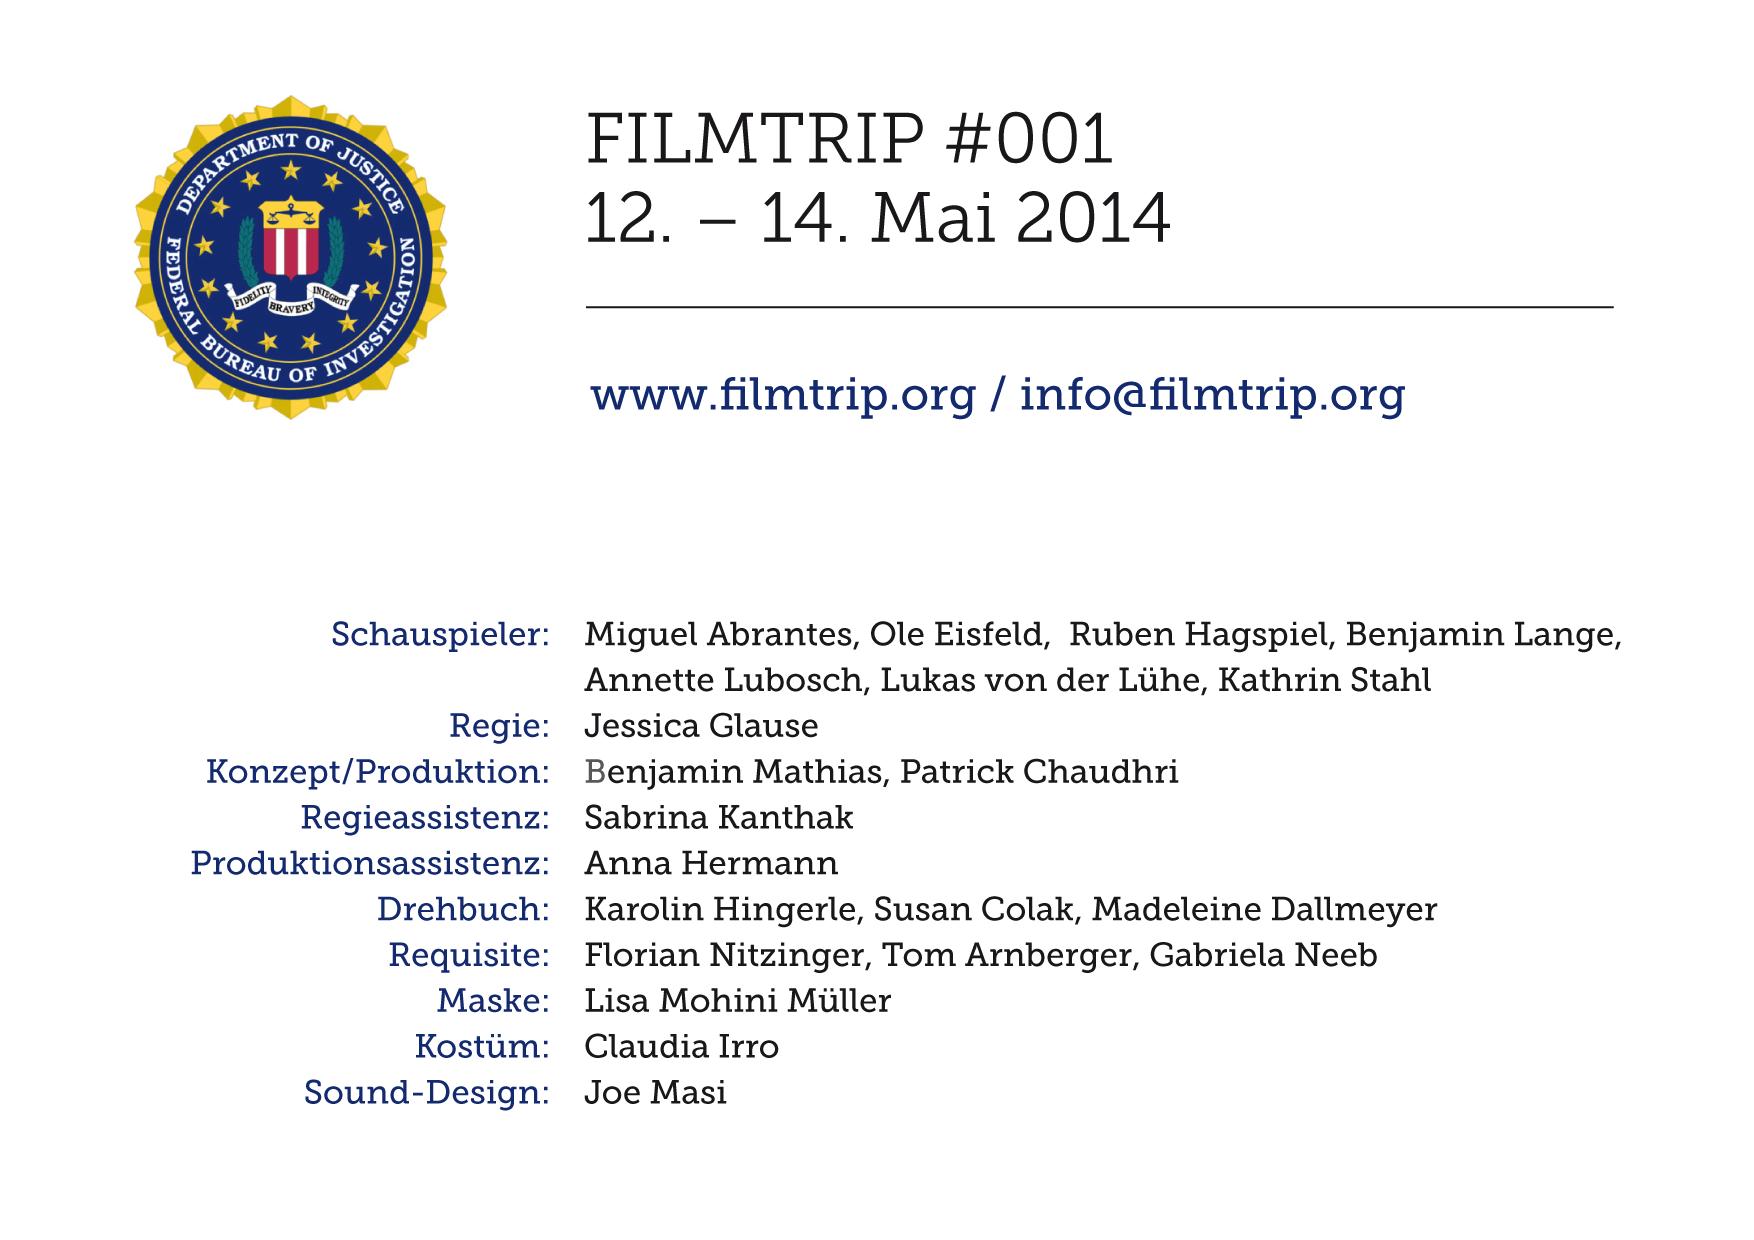 FILMTRIP#001_Cast-Crew.png